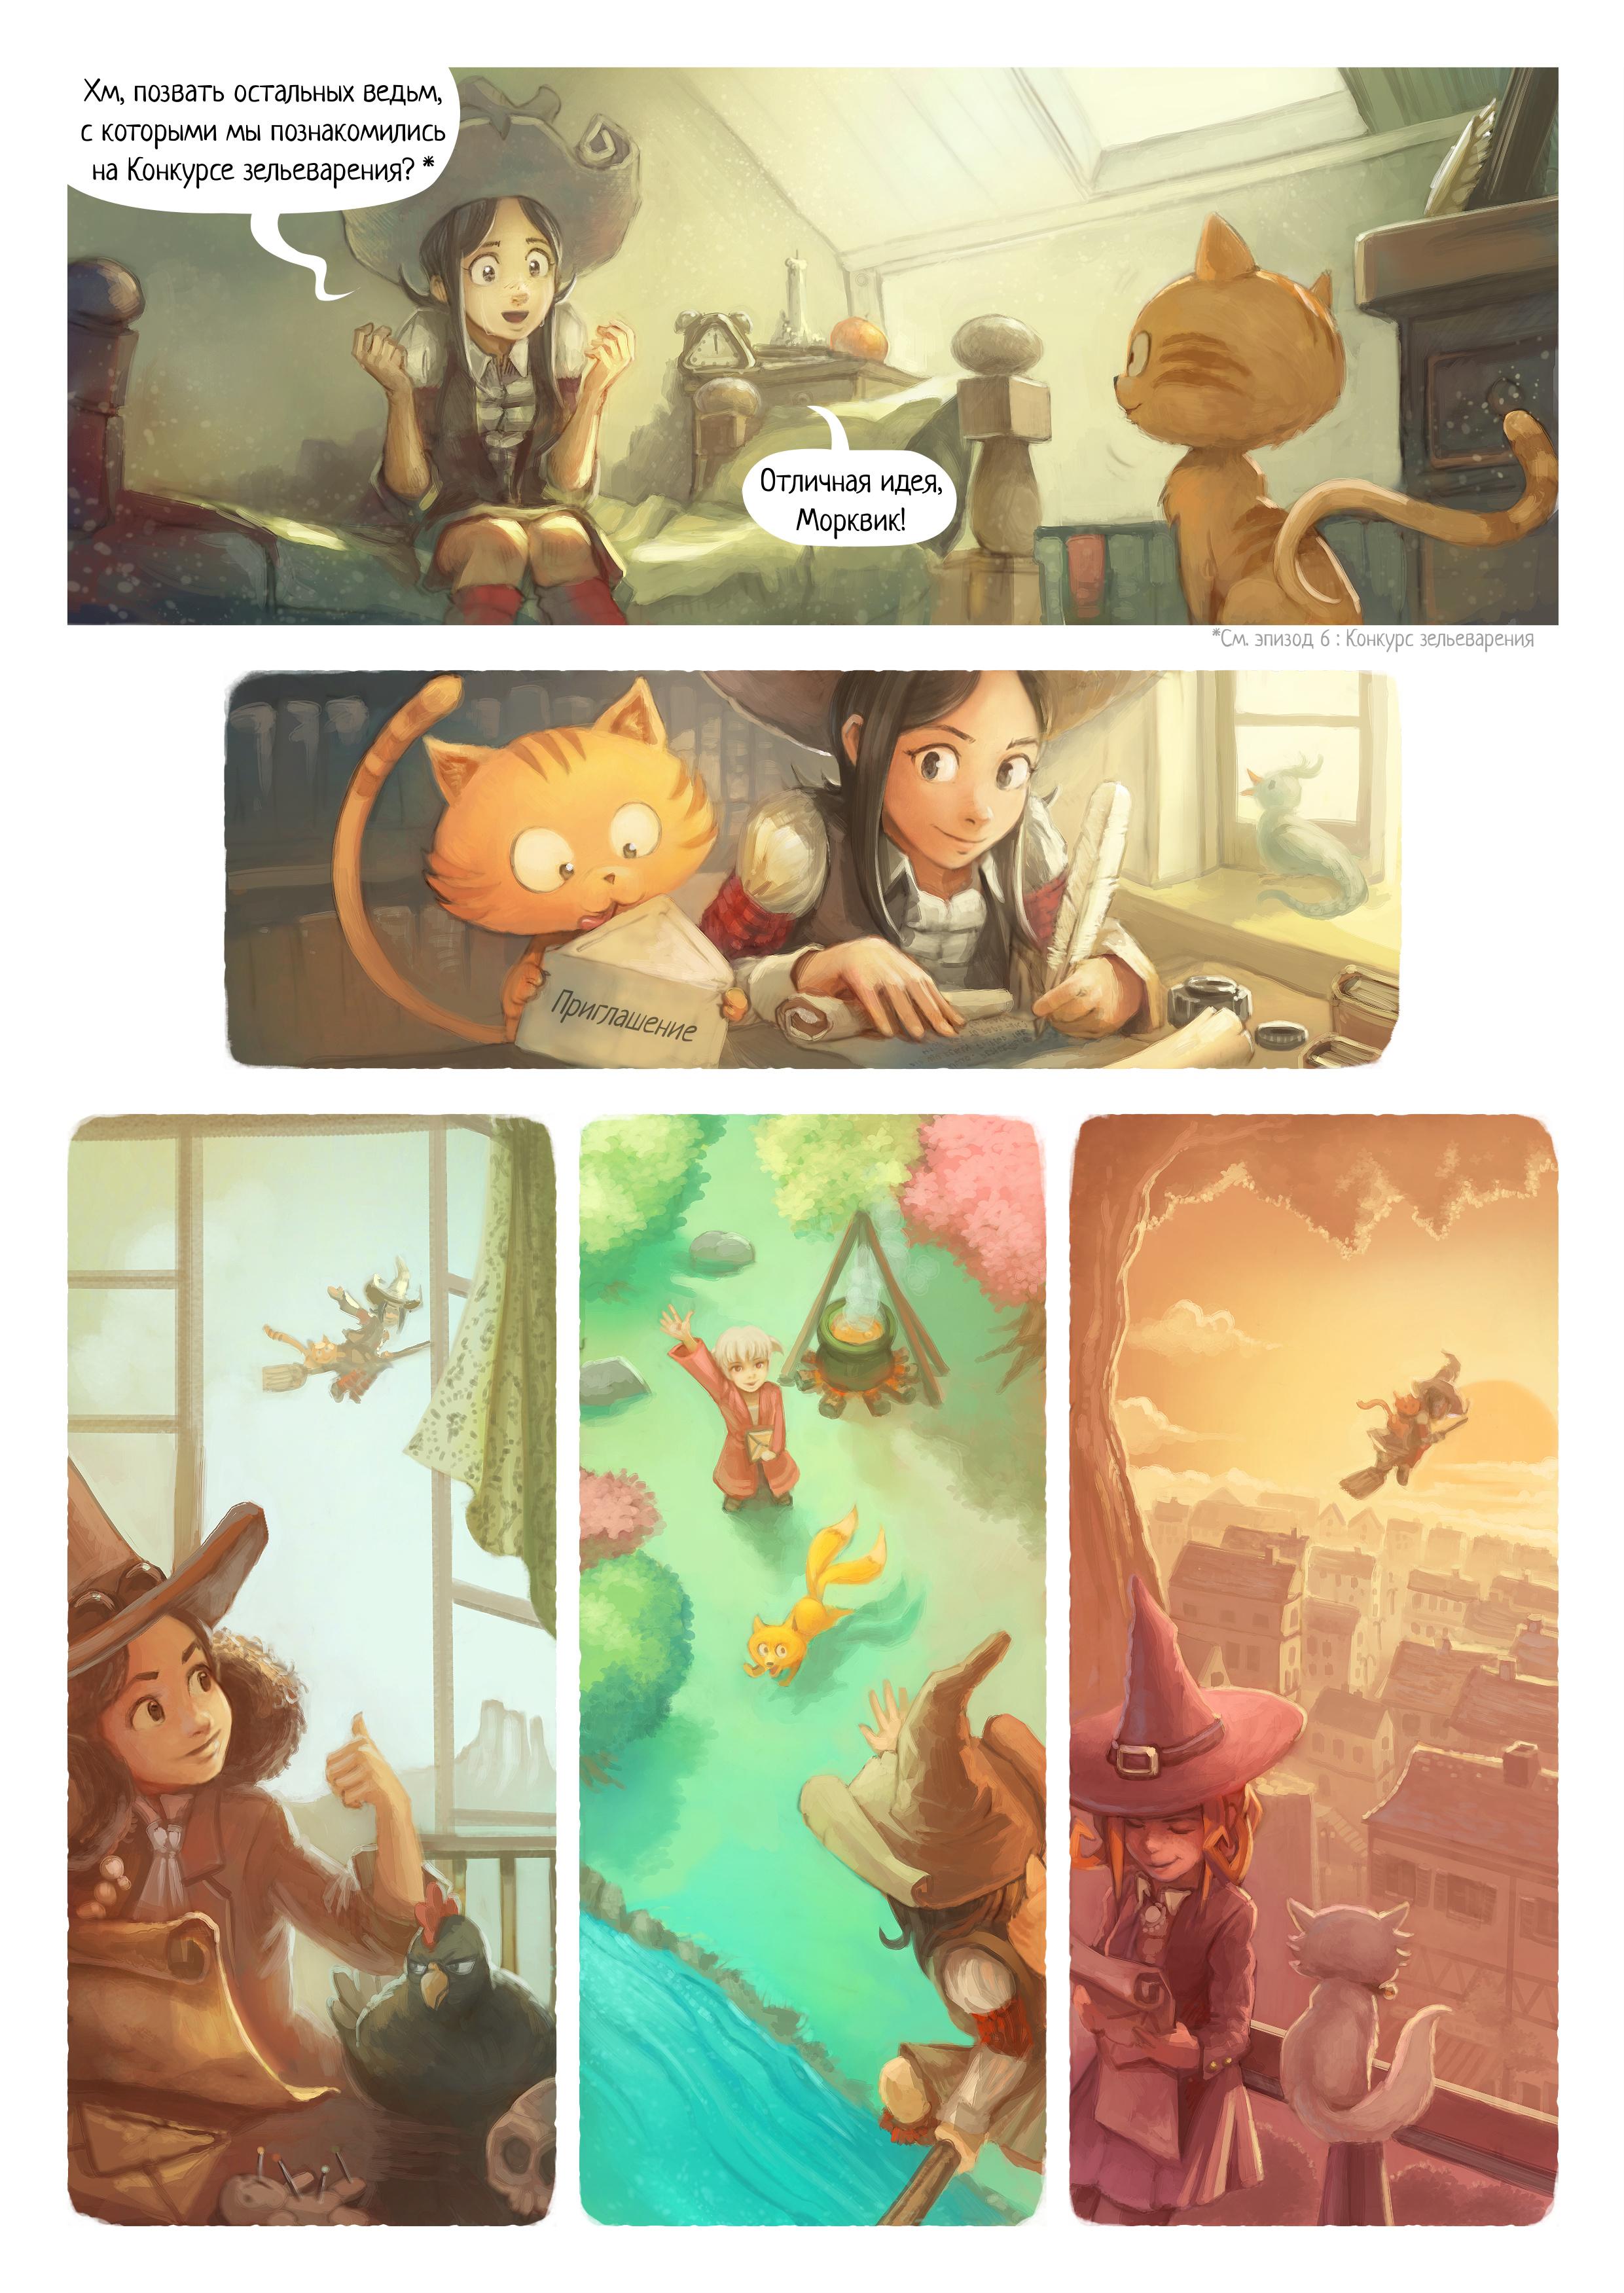 A webcomic page of Pepper&Carrot, эпизод 8 [ru], стр. 2